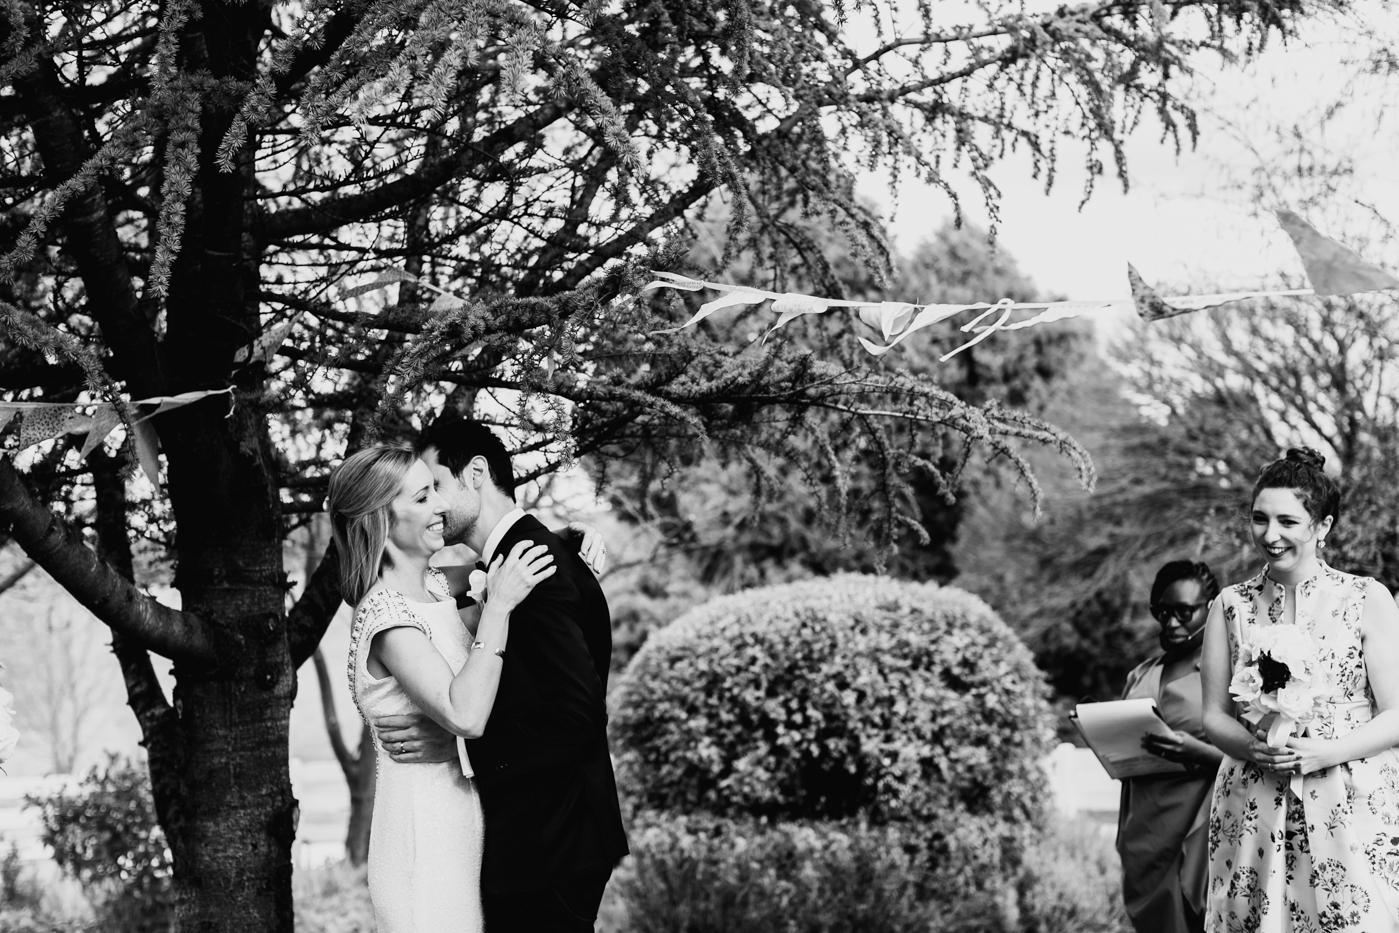 Bridget & James - Orange Country Wedding - Samantha Heather Photography-49.jpg